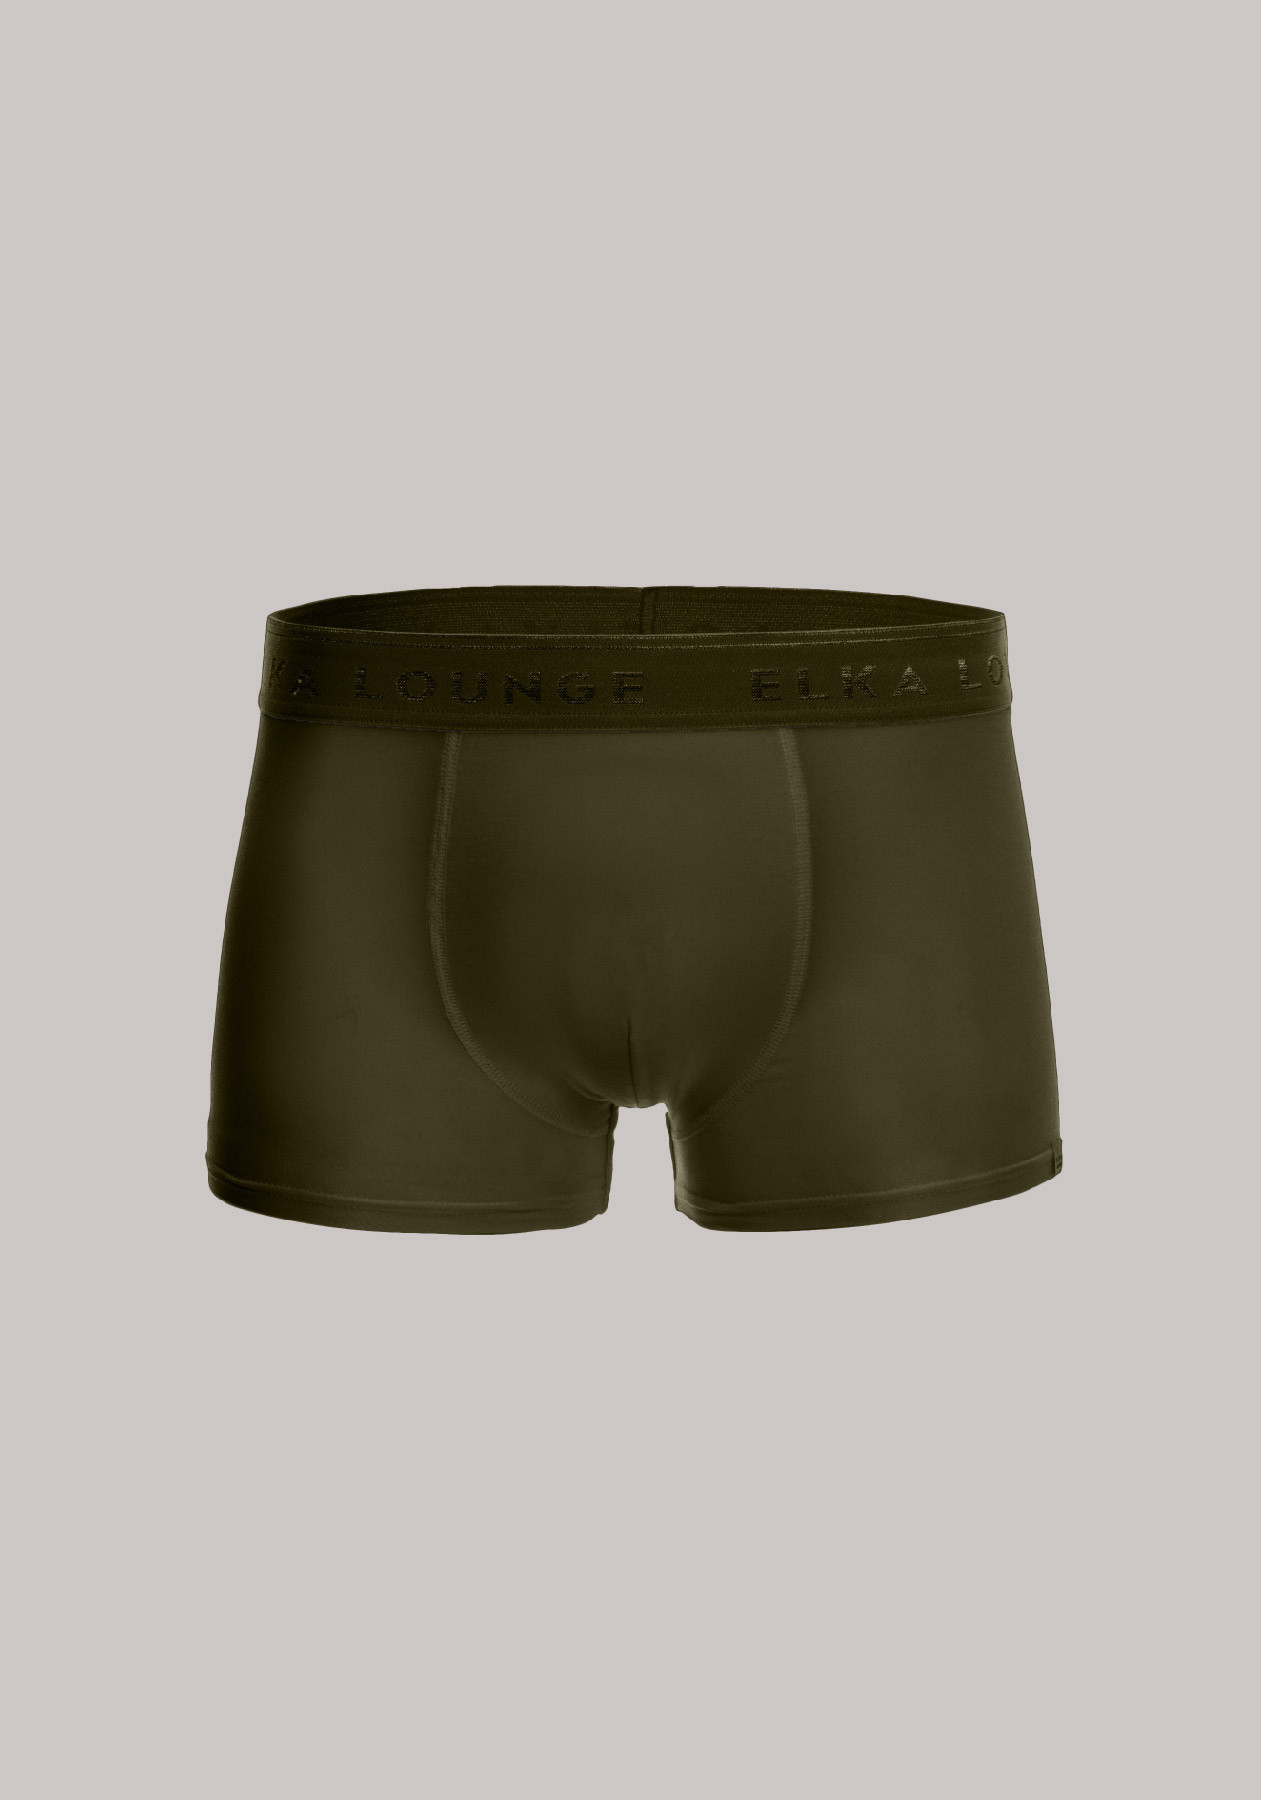 Men-Boxers-ELKA-Lounge-M00561